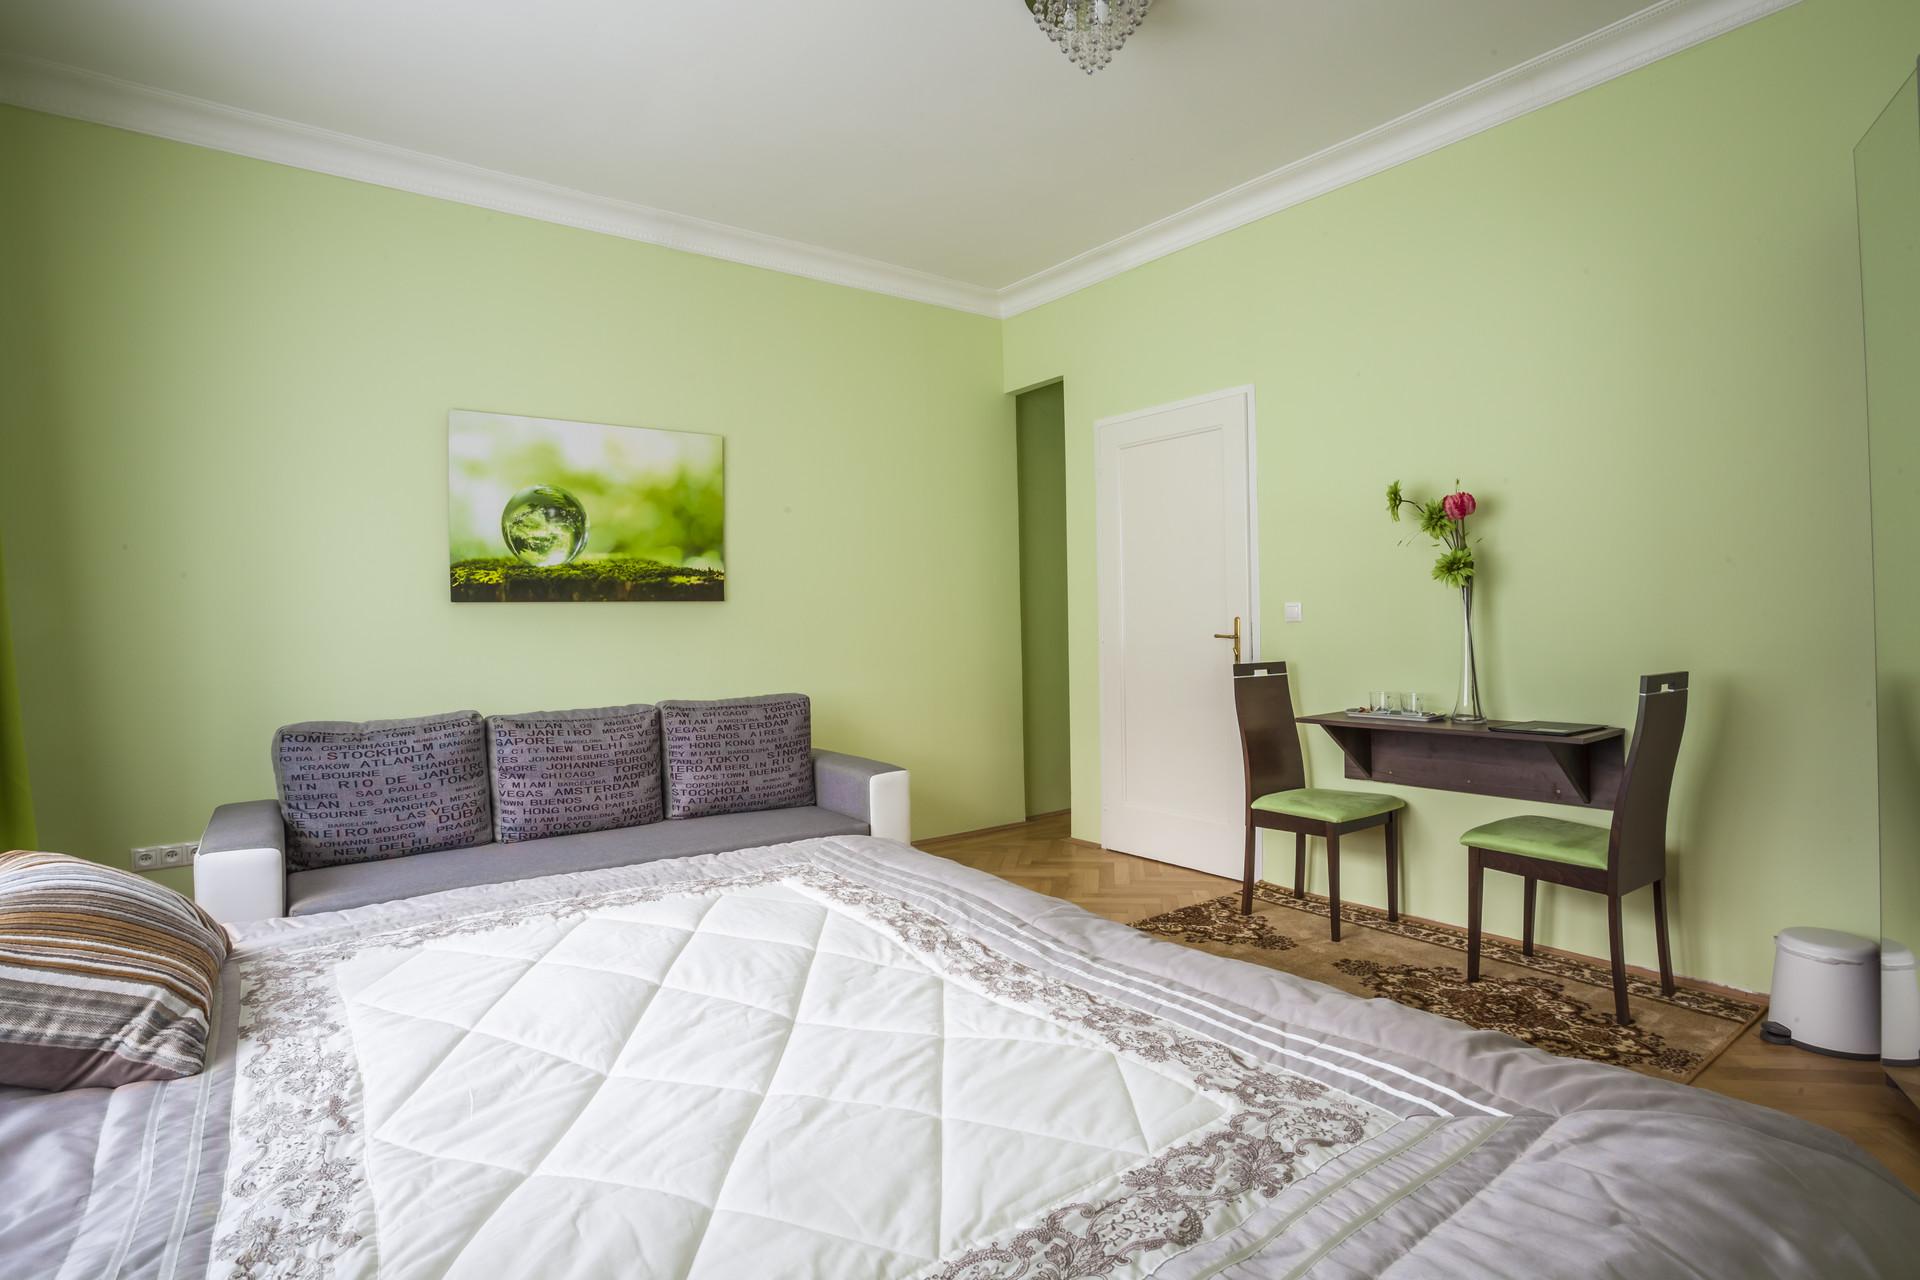 specious-4bed-apartment-short-long-term-2c185098ead7261f74d86c9ab2e1427a